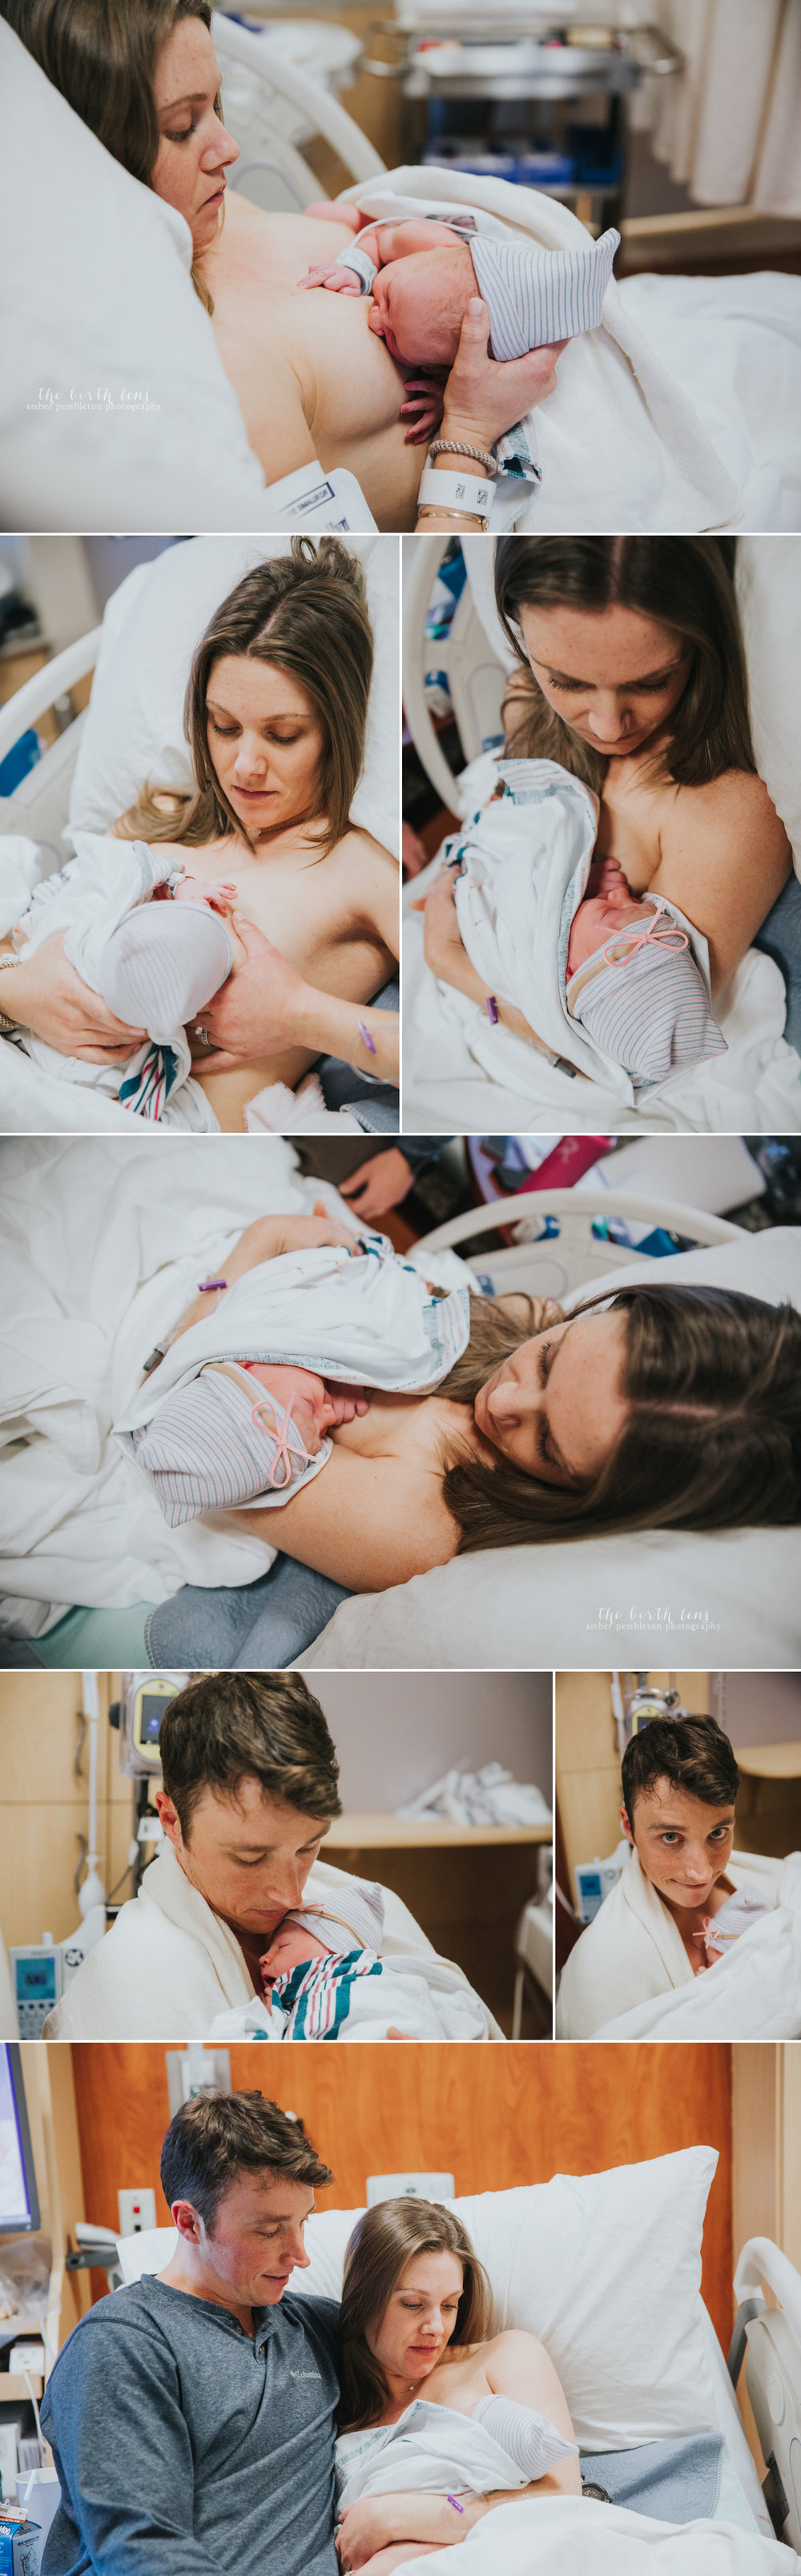 baby-just-born-hospital.jpg